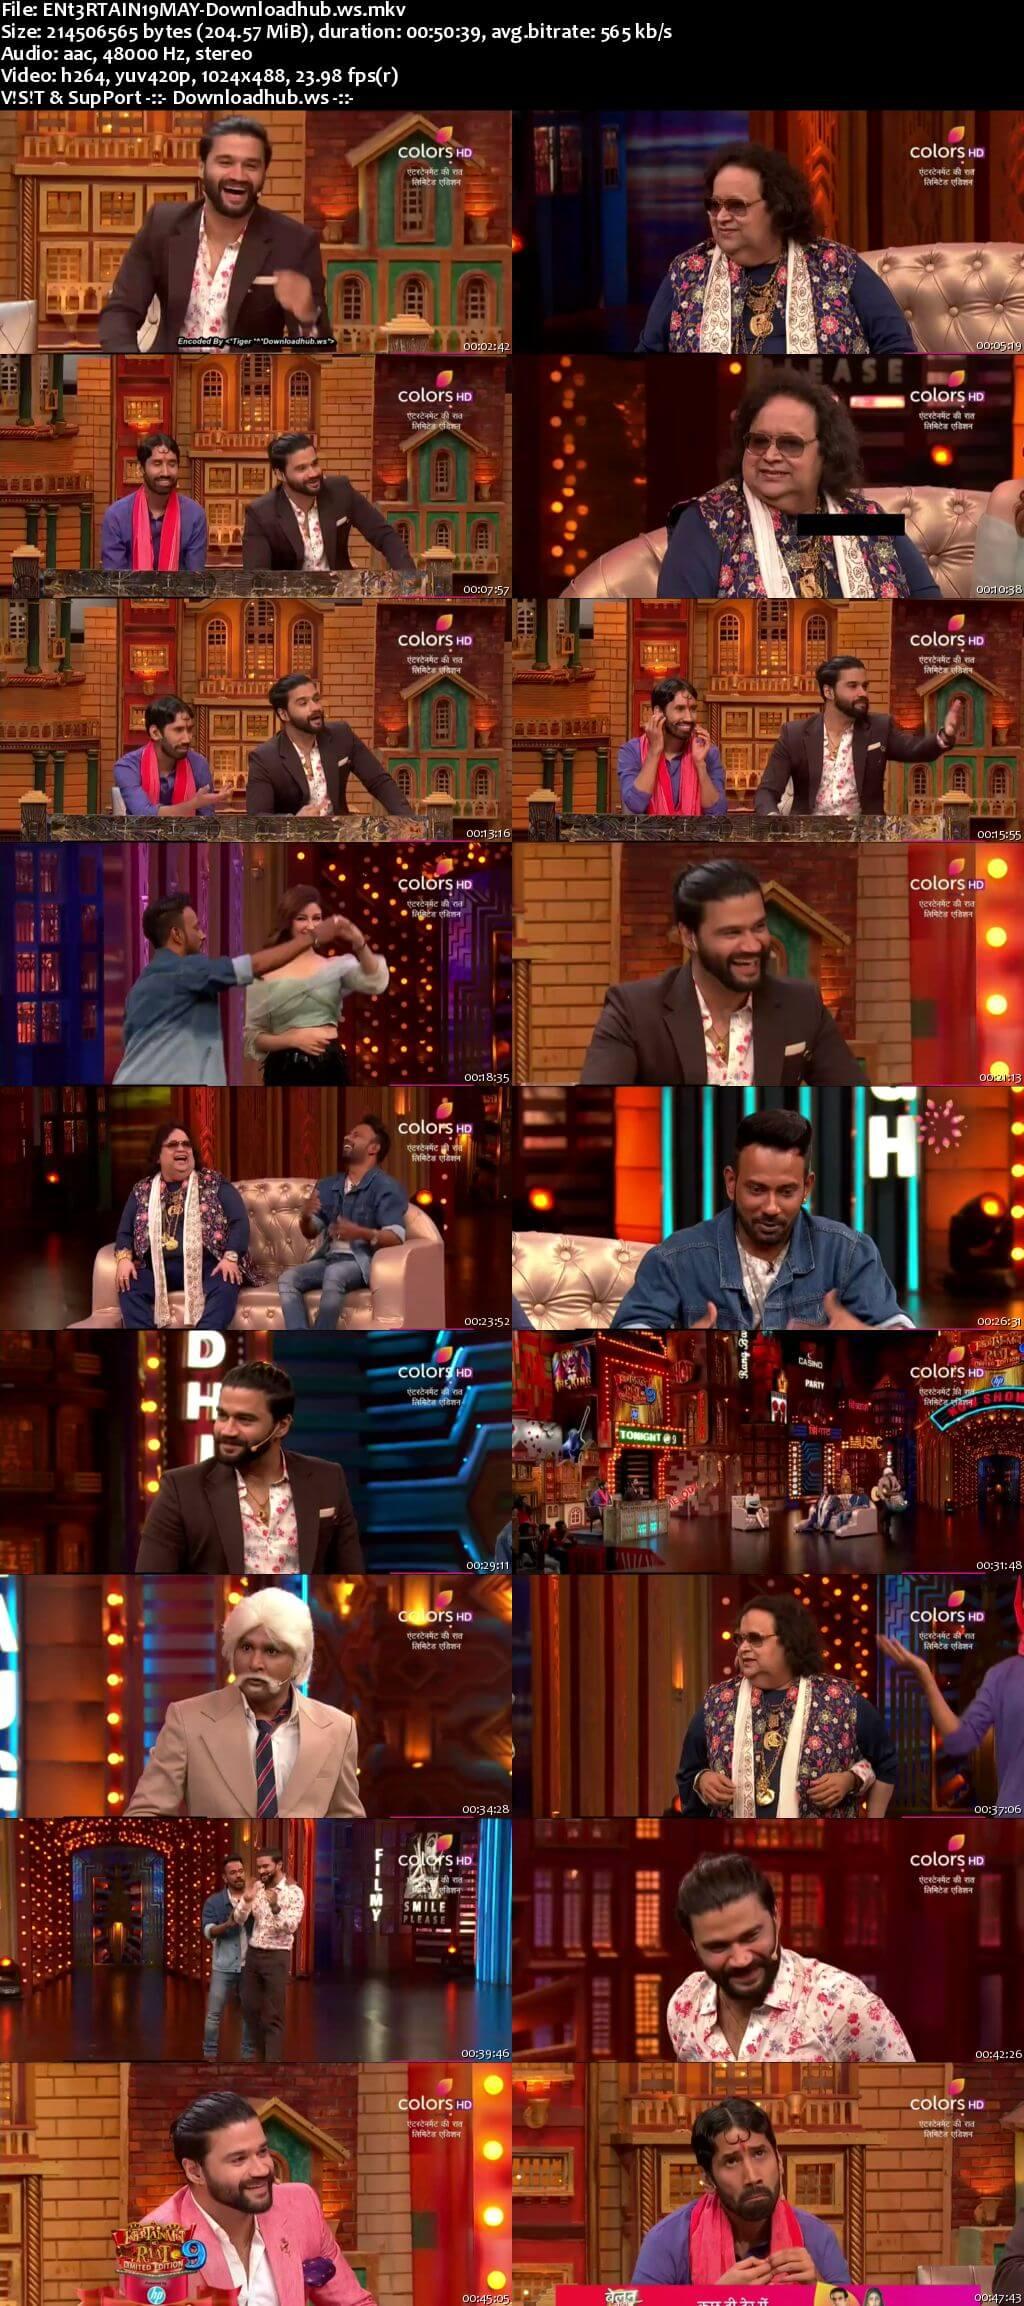 Entertainment Ki Raat 19 May 2018 Episode 35 HDTV 480p